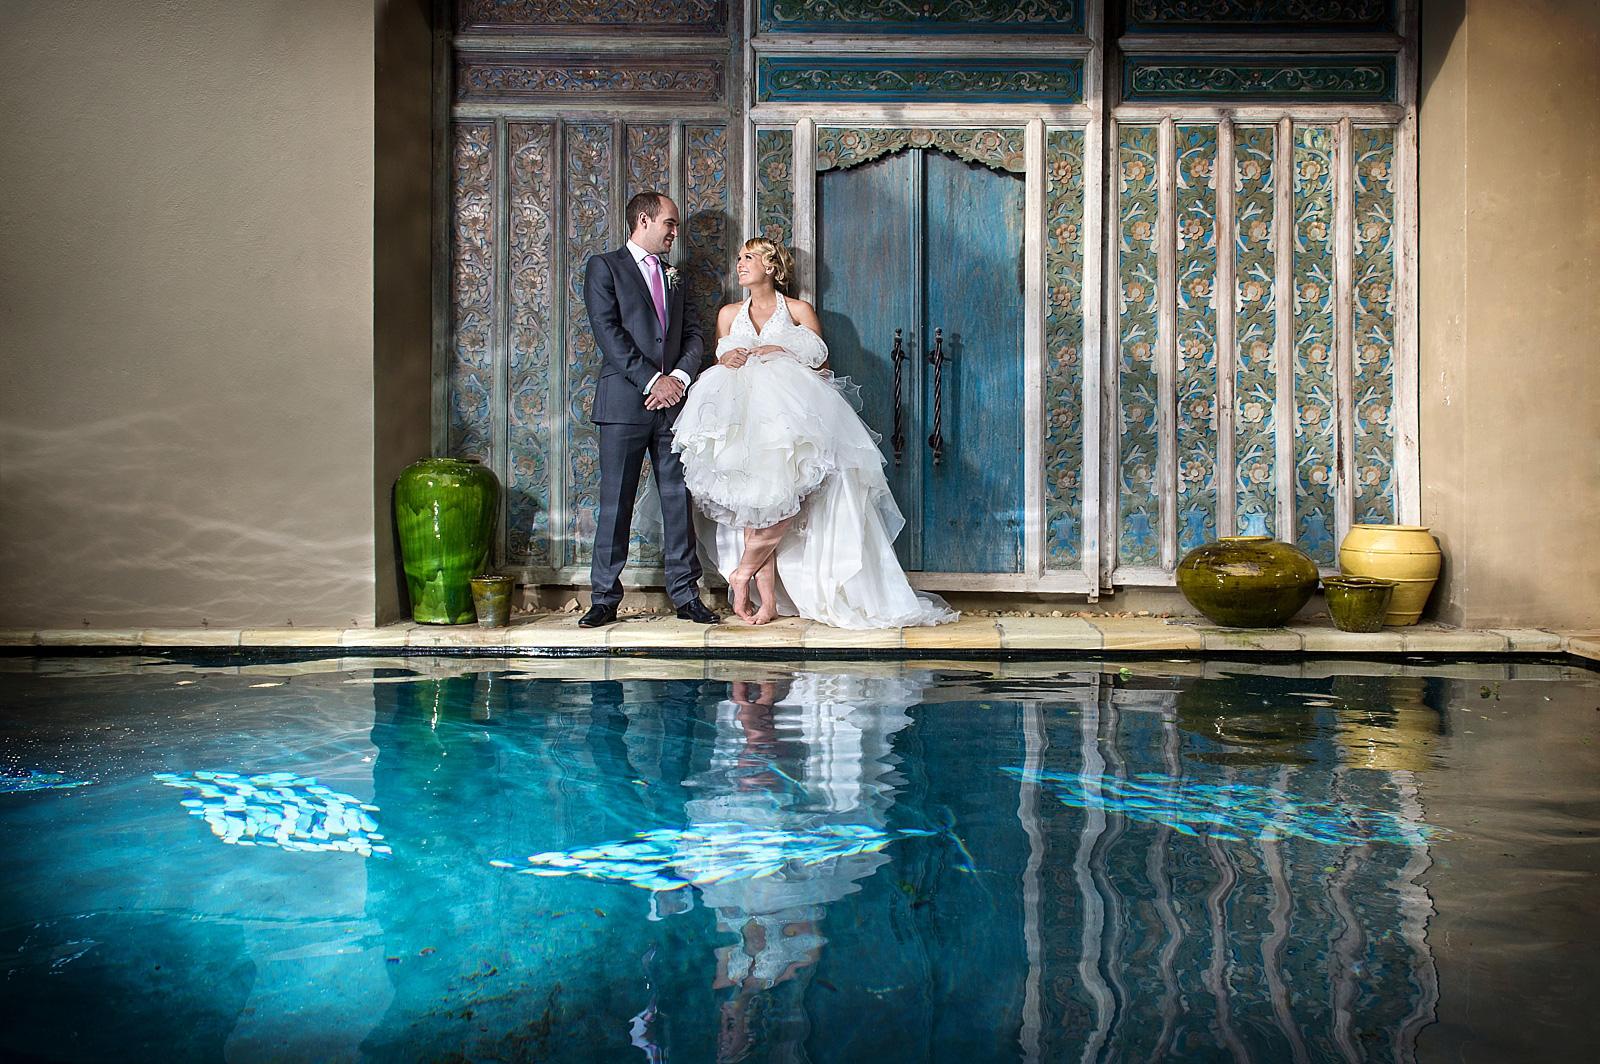 Zimbali-Wedding-Top-Creative-South-African-Wedding-Photographer-Jacki-Bruniquel-01